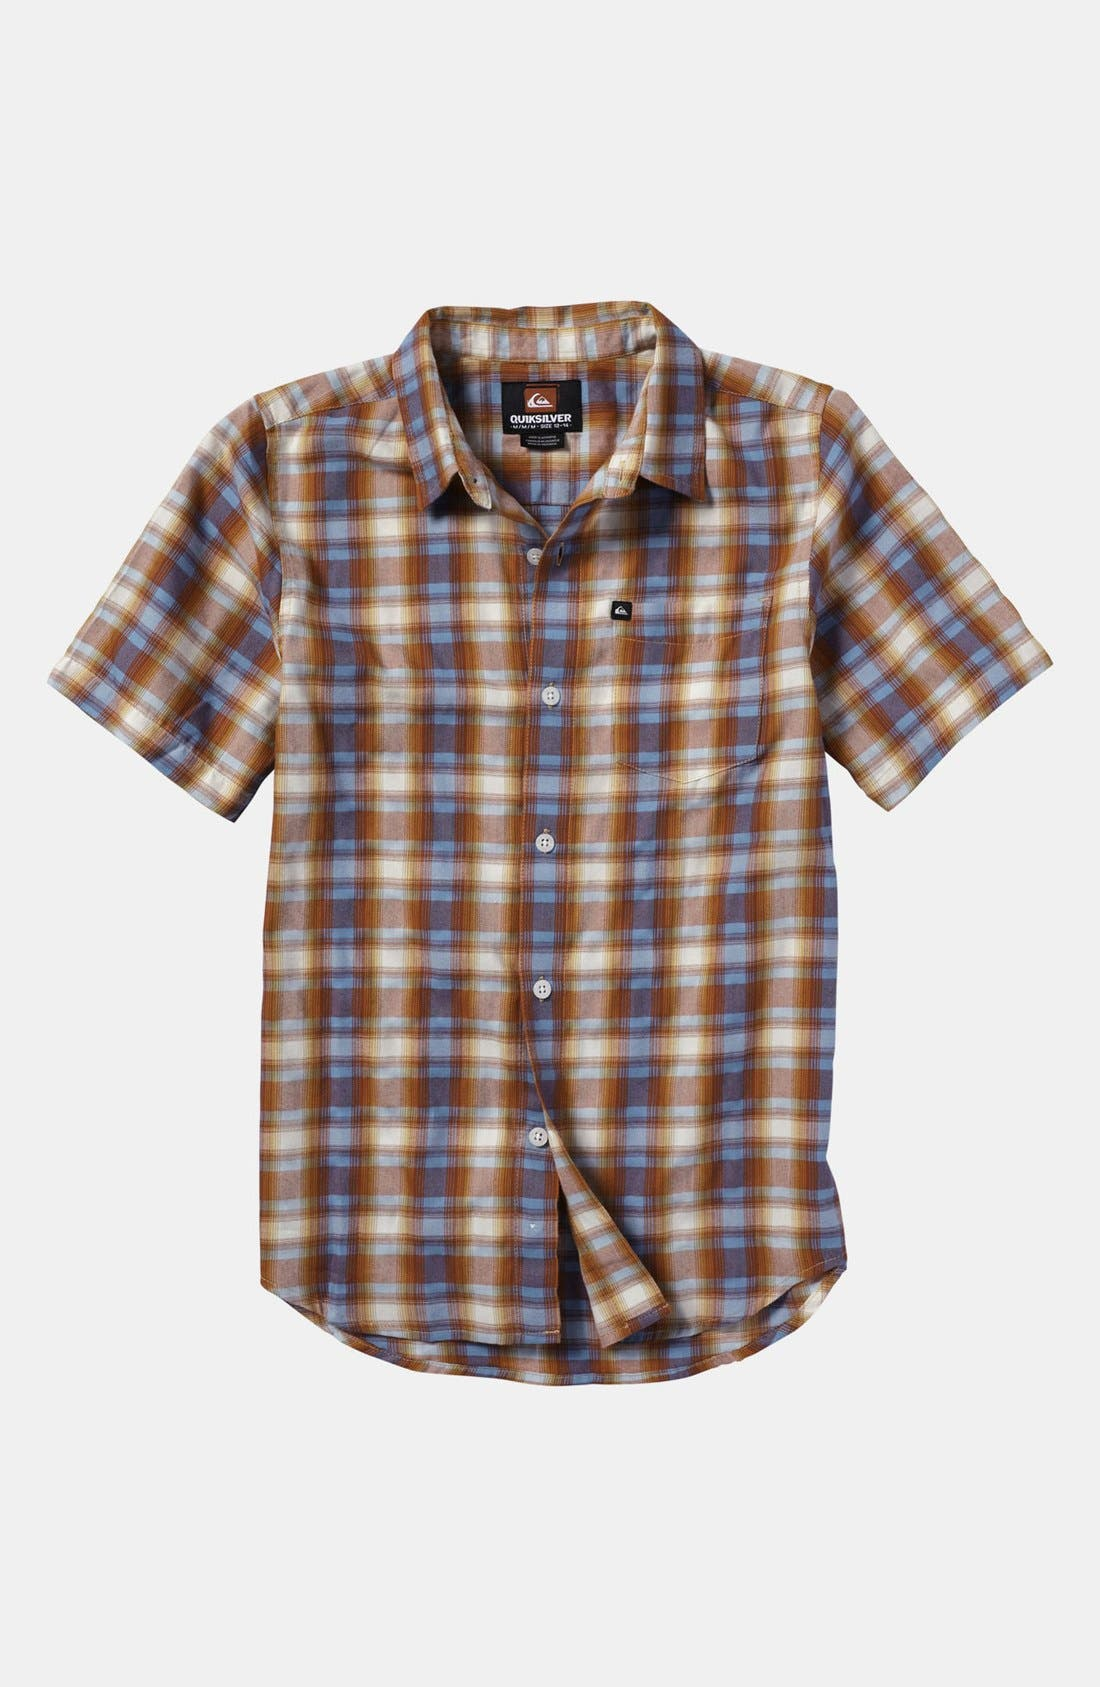 Main Image - Quiksilver 'Flash Surf' Woven Shirt (Toddler)